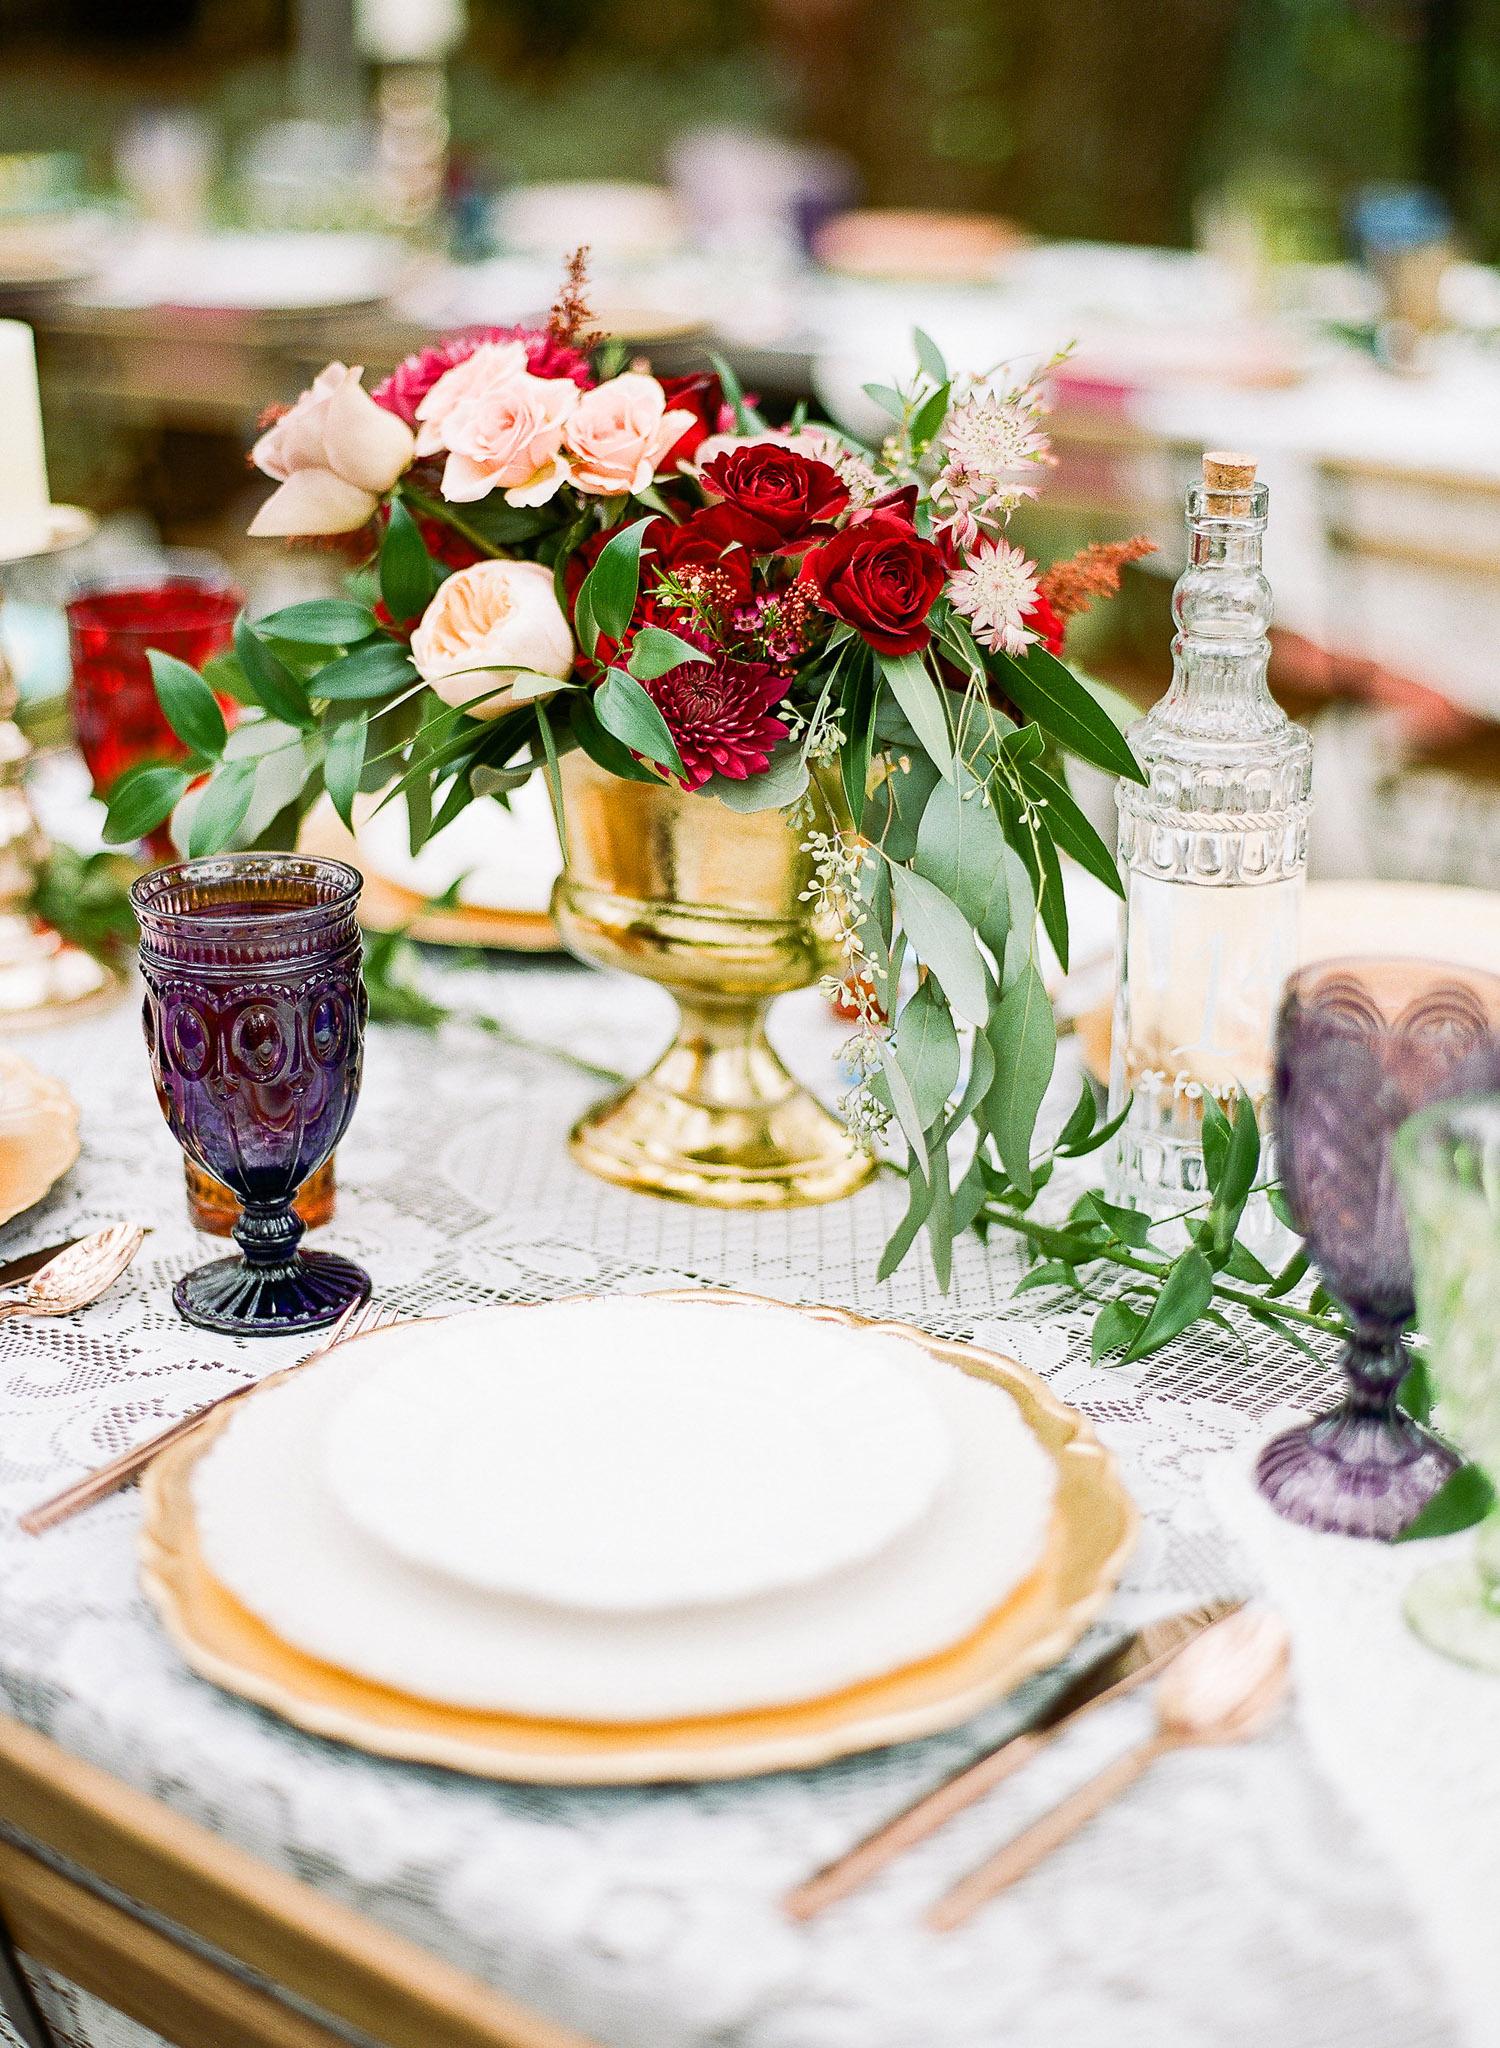 Jewel tone wedding decor